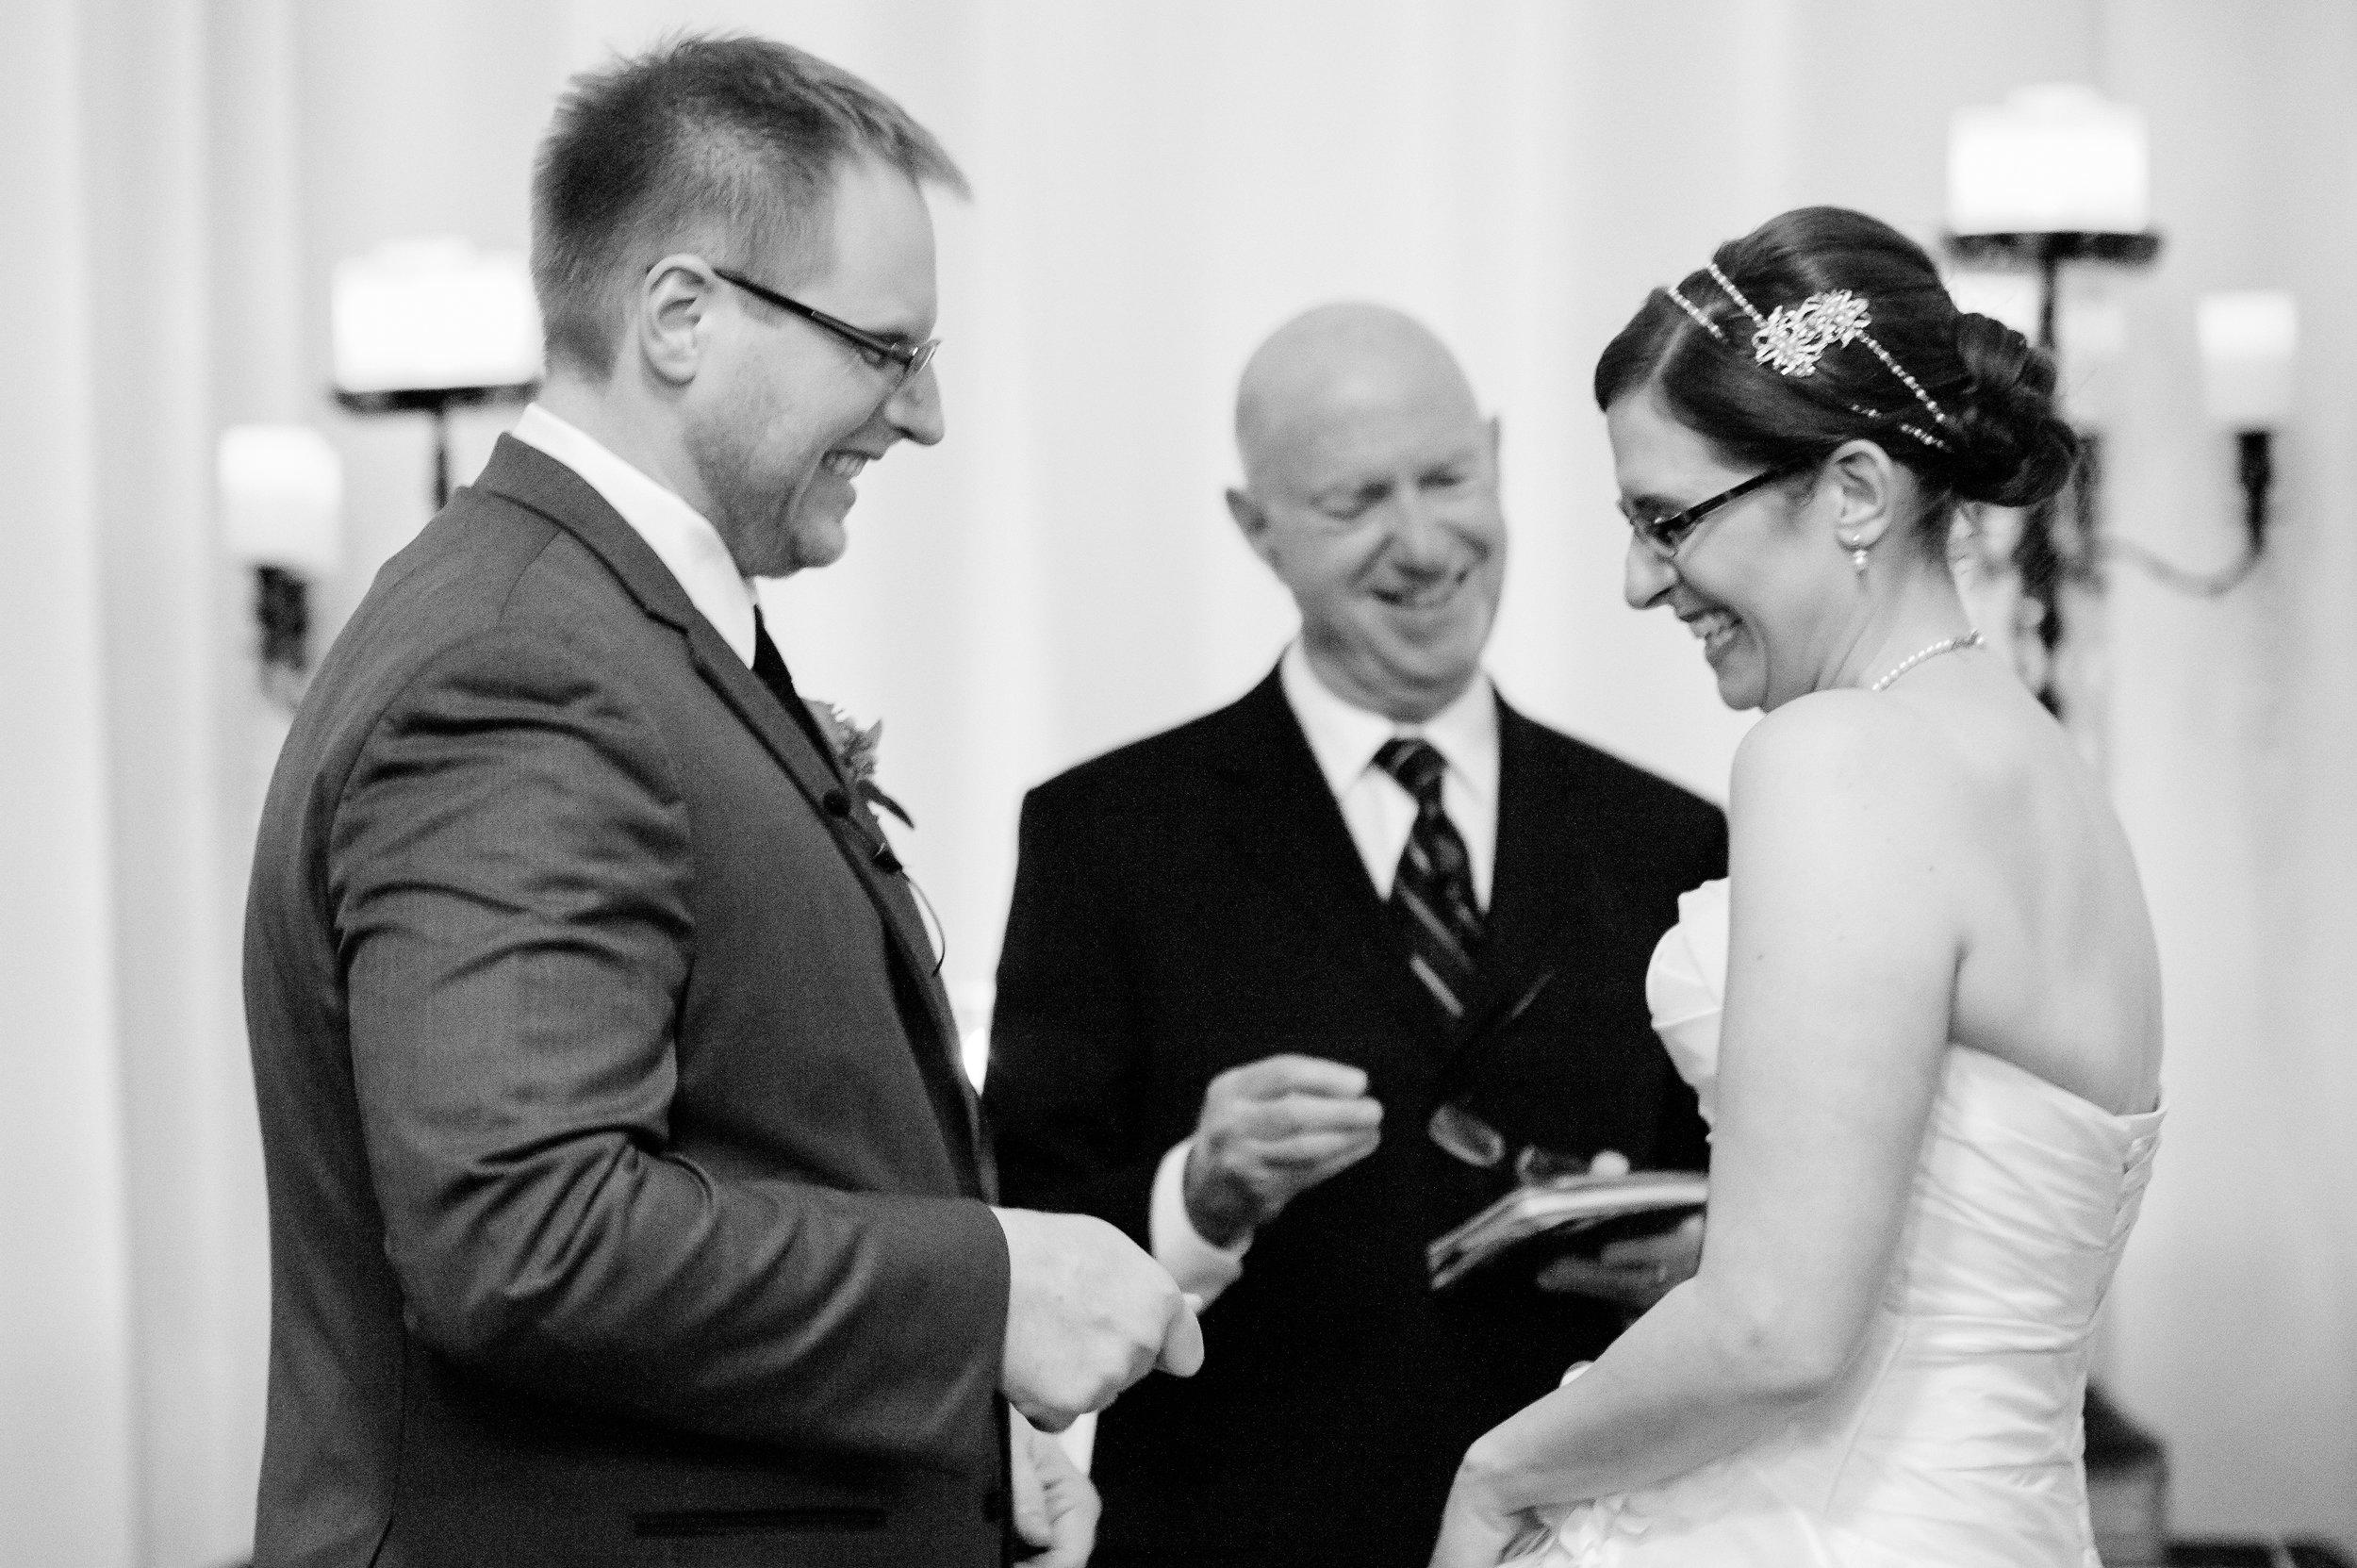 judith-john-023-citizen-hotel-sacramento-wedding-photographer-katherine-nicole-photography.JPG